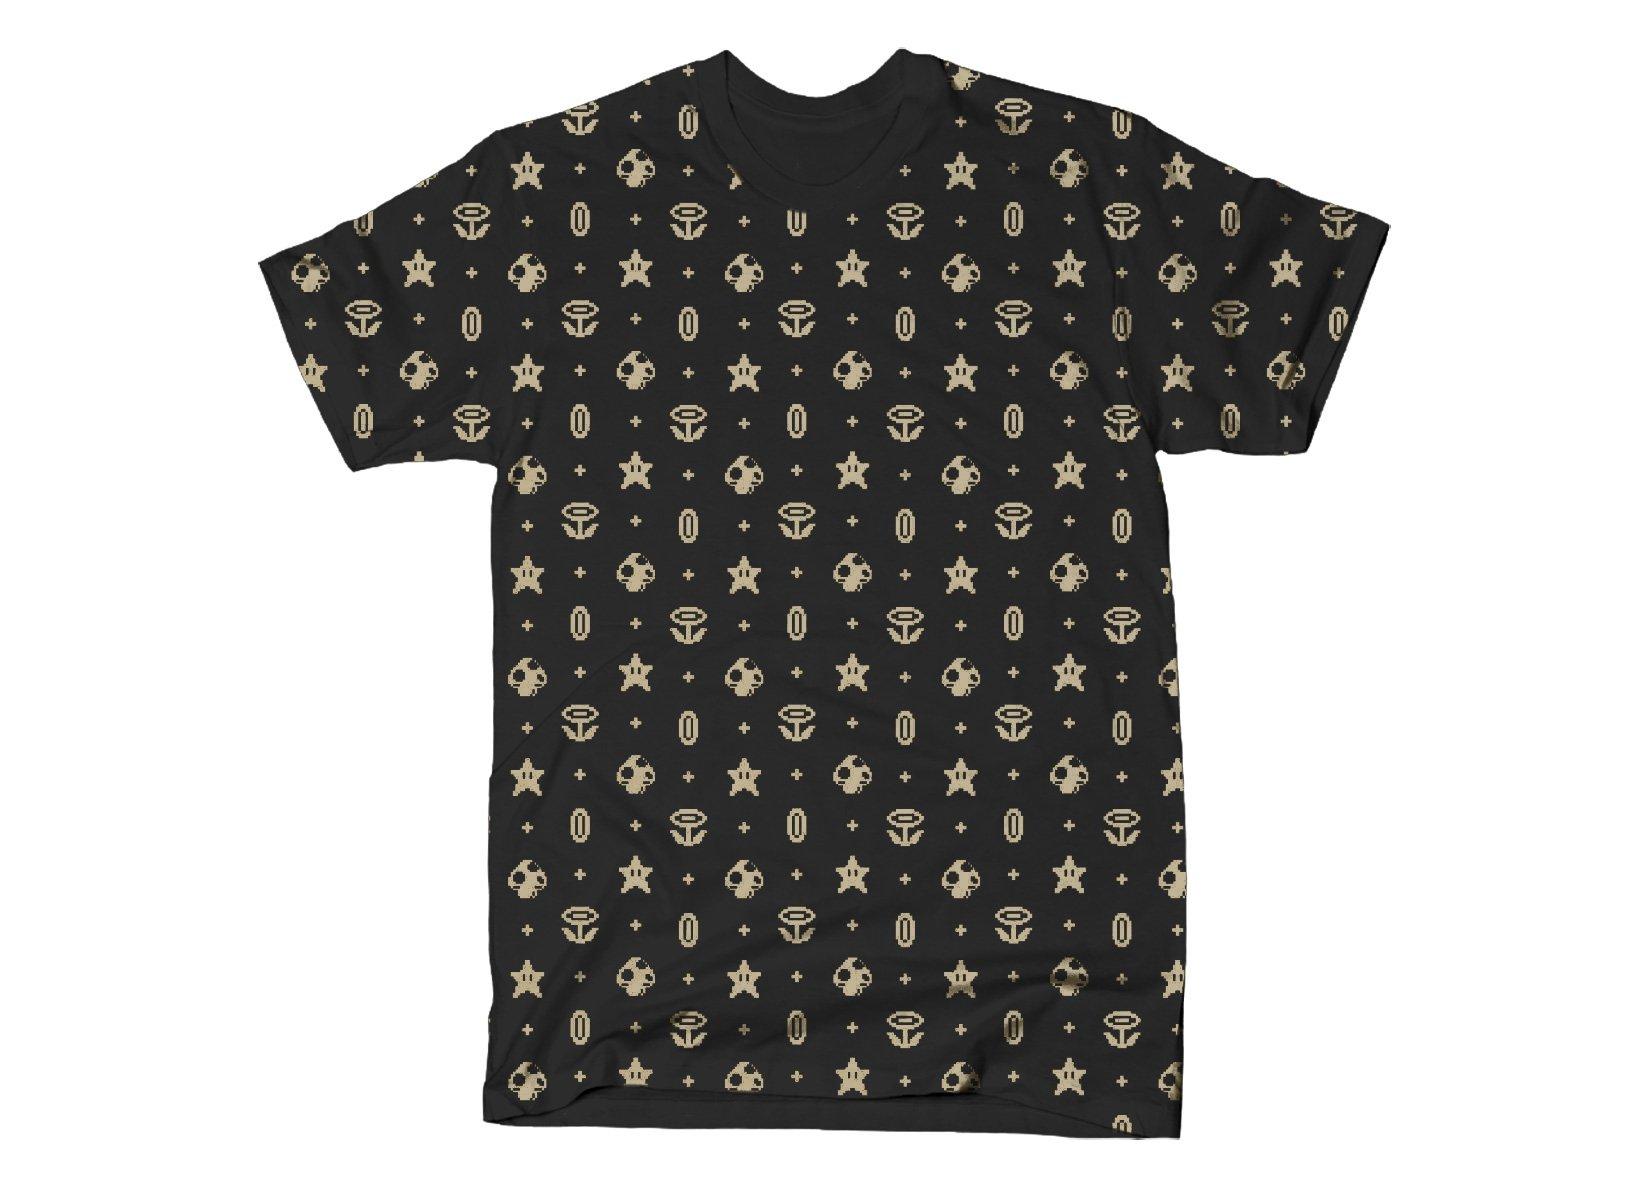 Pixels Pattern print on Mens T-Shirt